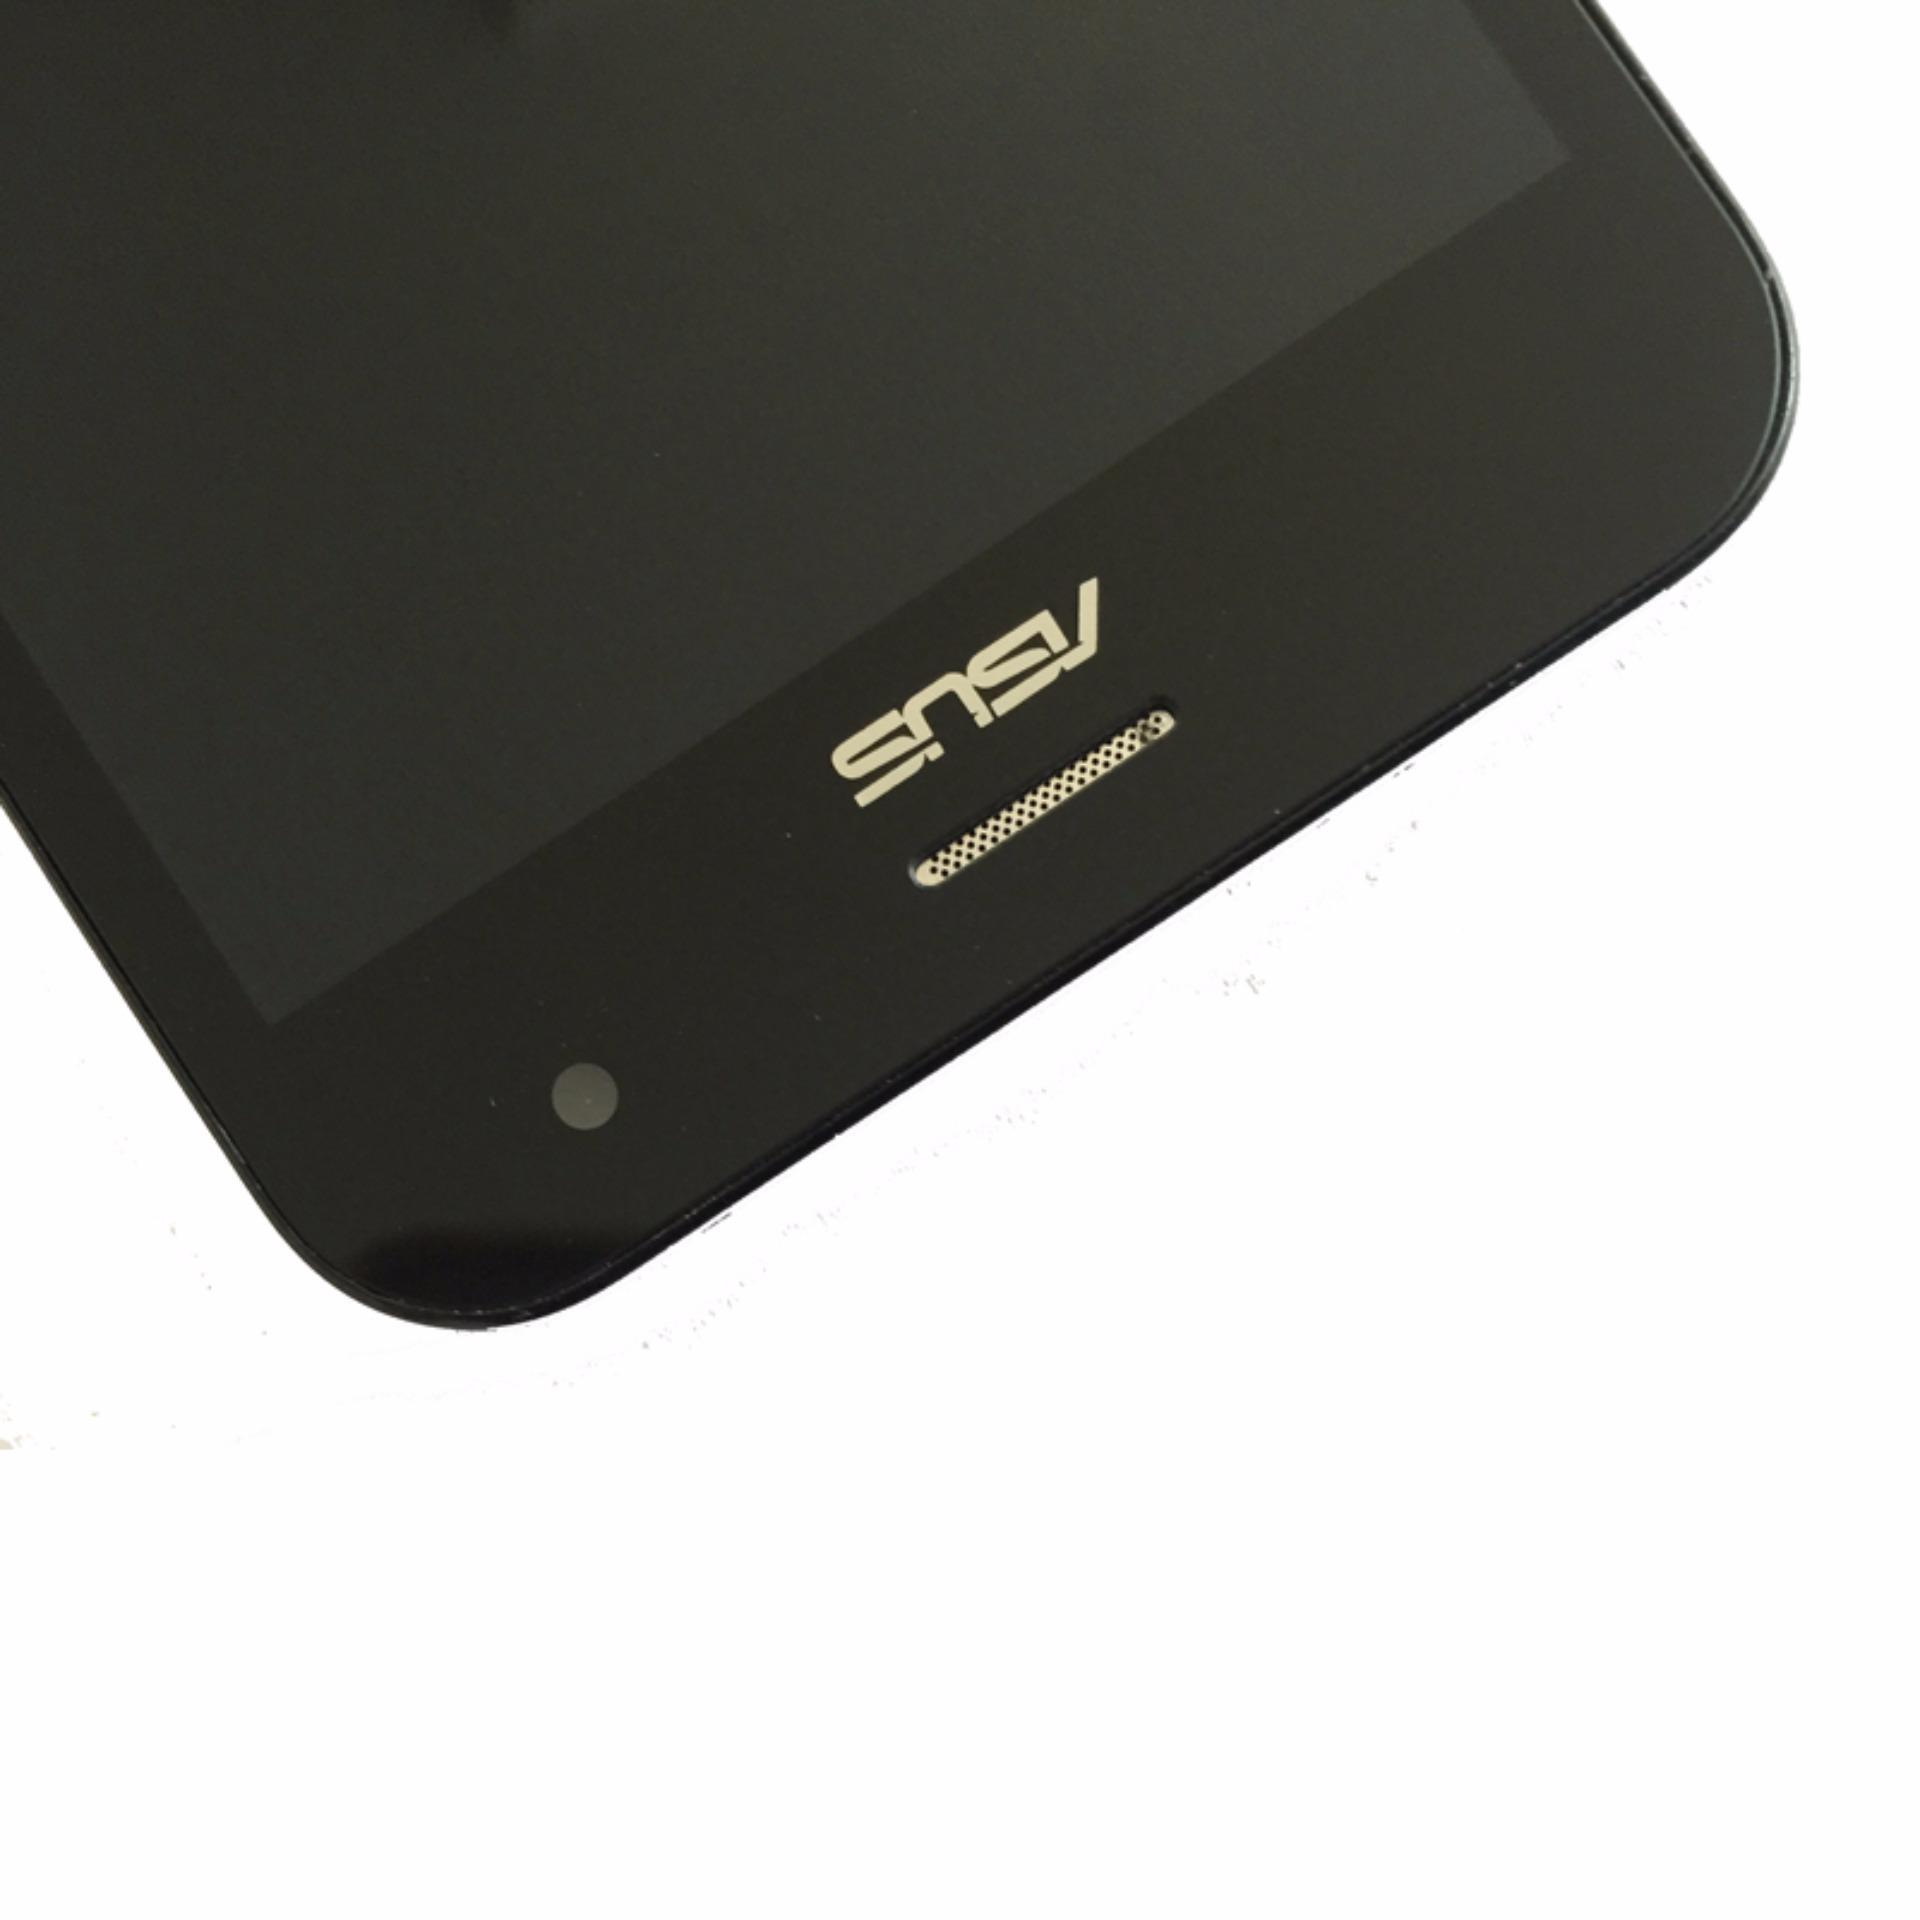 Discount Bluesky For Asus Zenfone 2 Ze500cl Lcd Display With Touch Touchscreen 6 Original Z00d Screen Digitizer Panel Glass Sensor Assembly